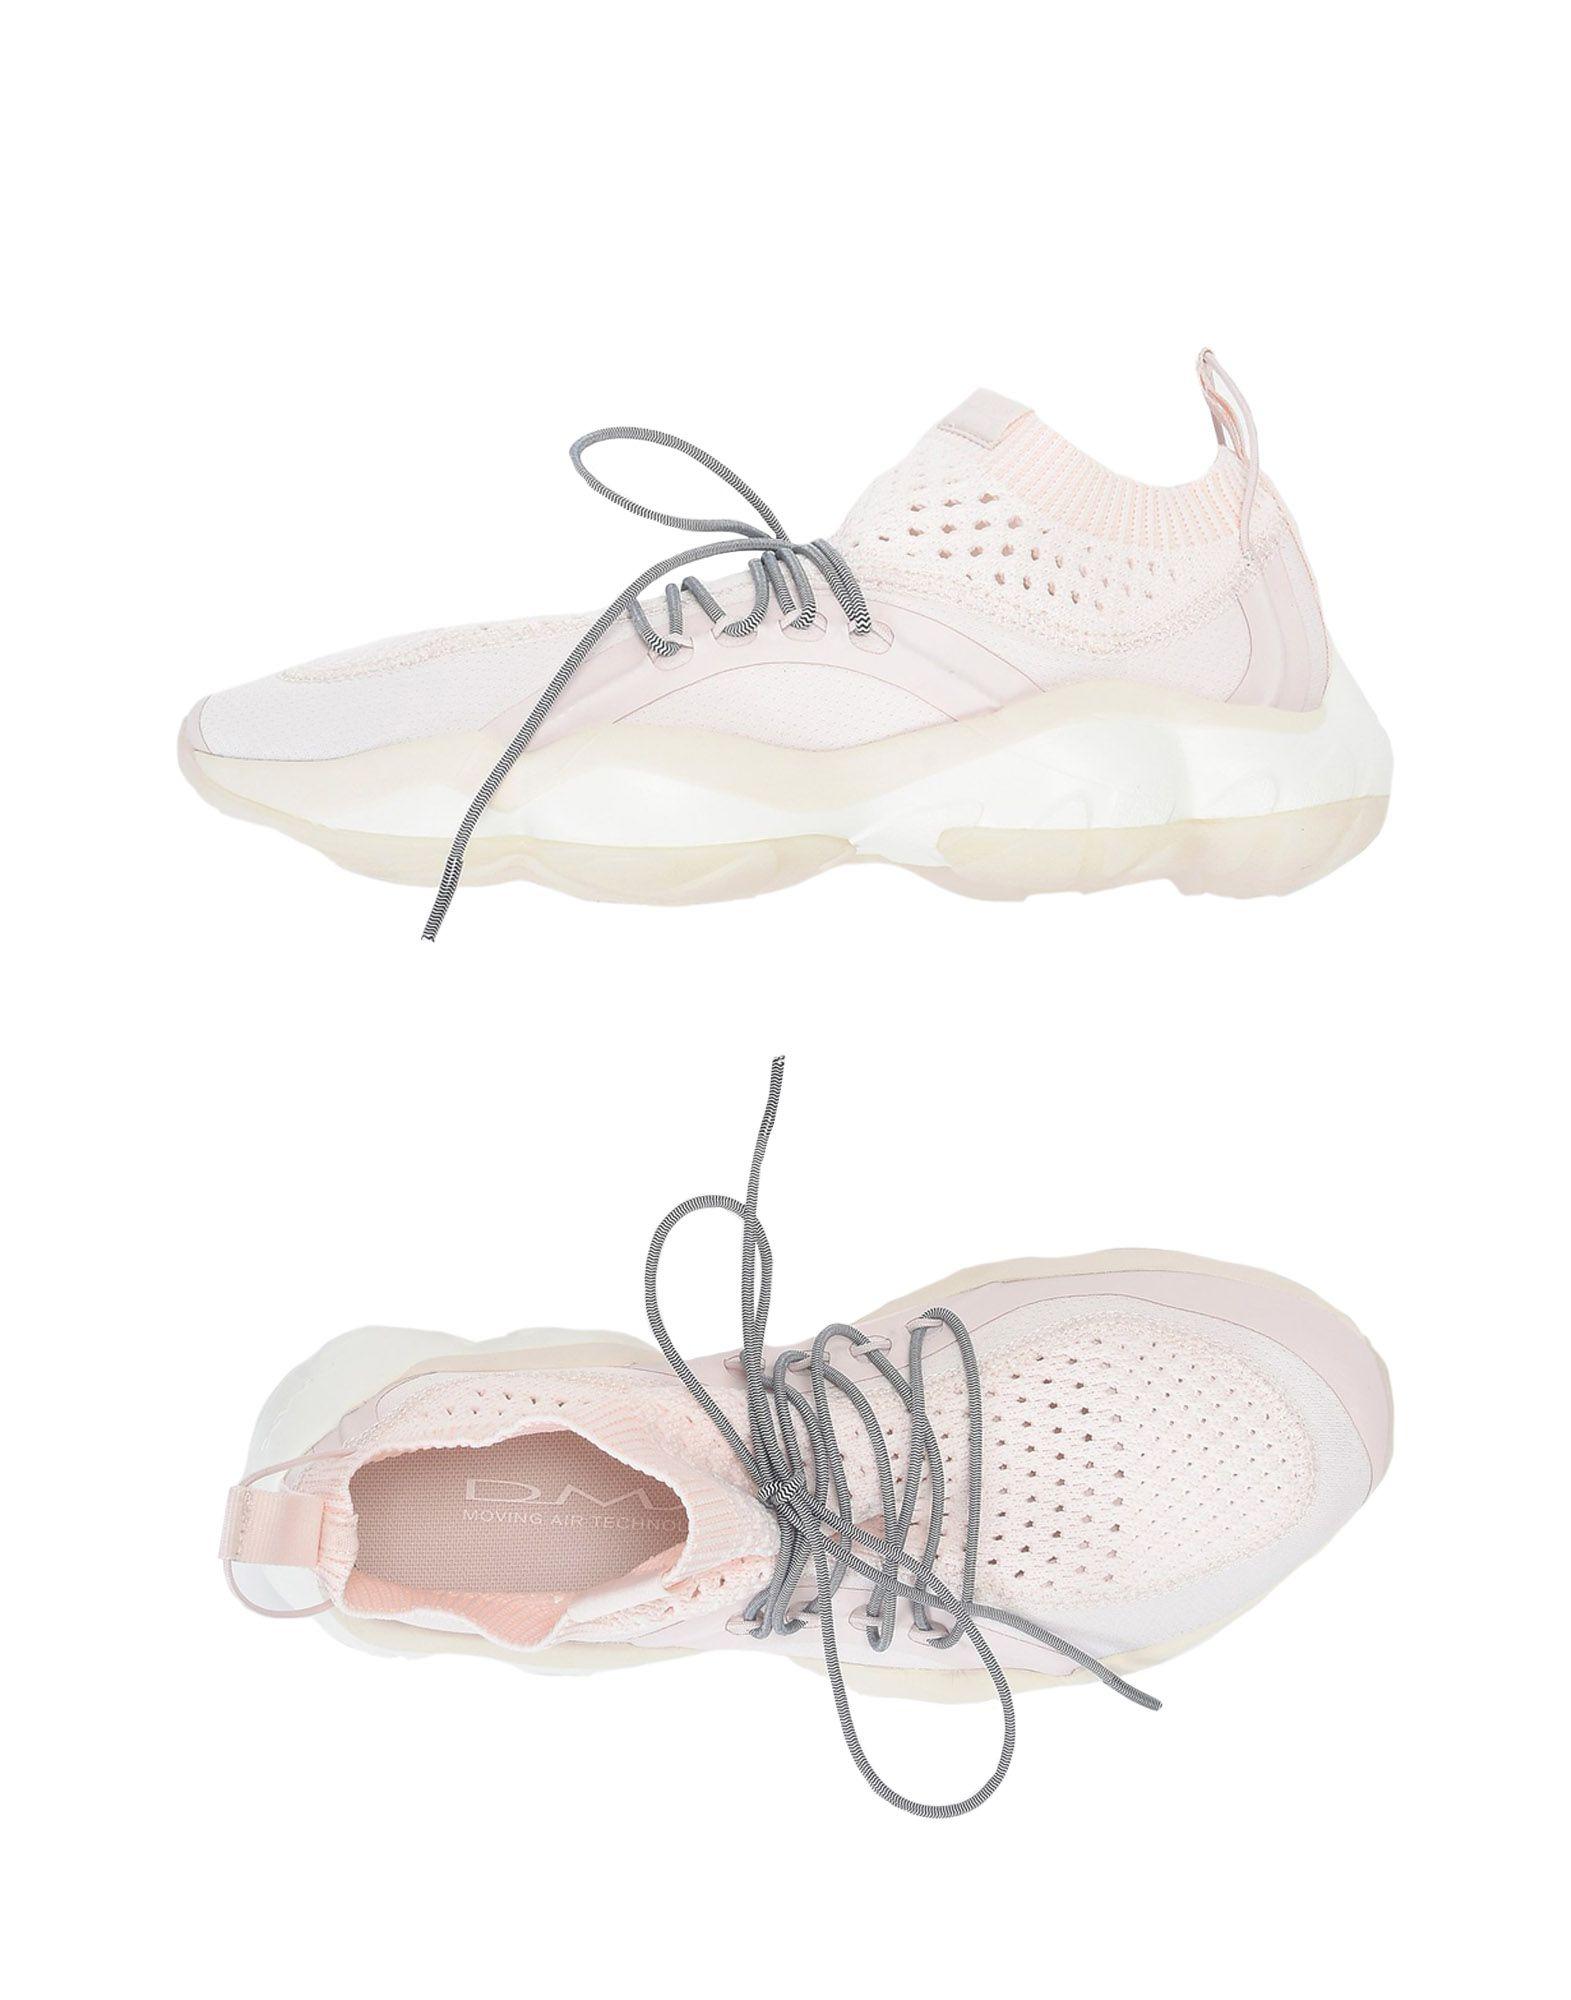 Sneakers Reebok Dmx Fusion Ci - Donna - 11495315AM